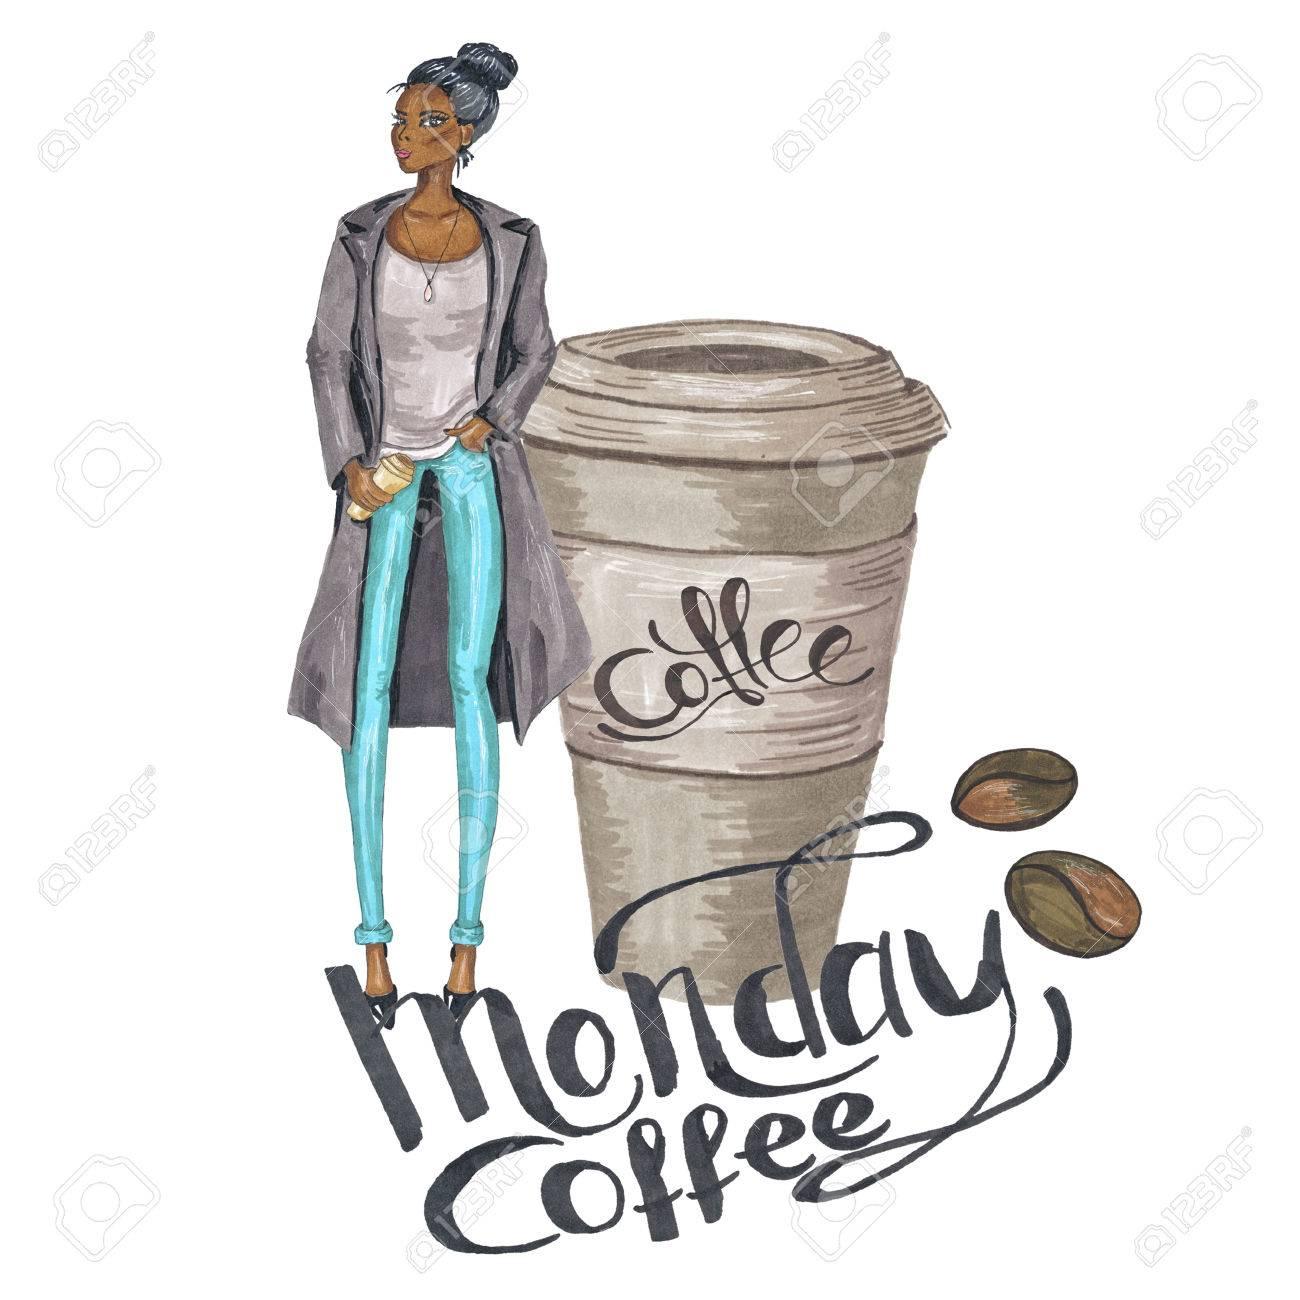 Hand-Painted Fashion Girl Monday Coffee Illustration Stock Photo ... #mondayCoffee